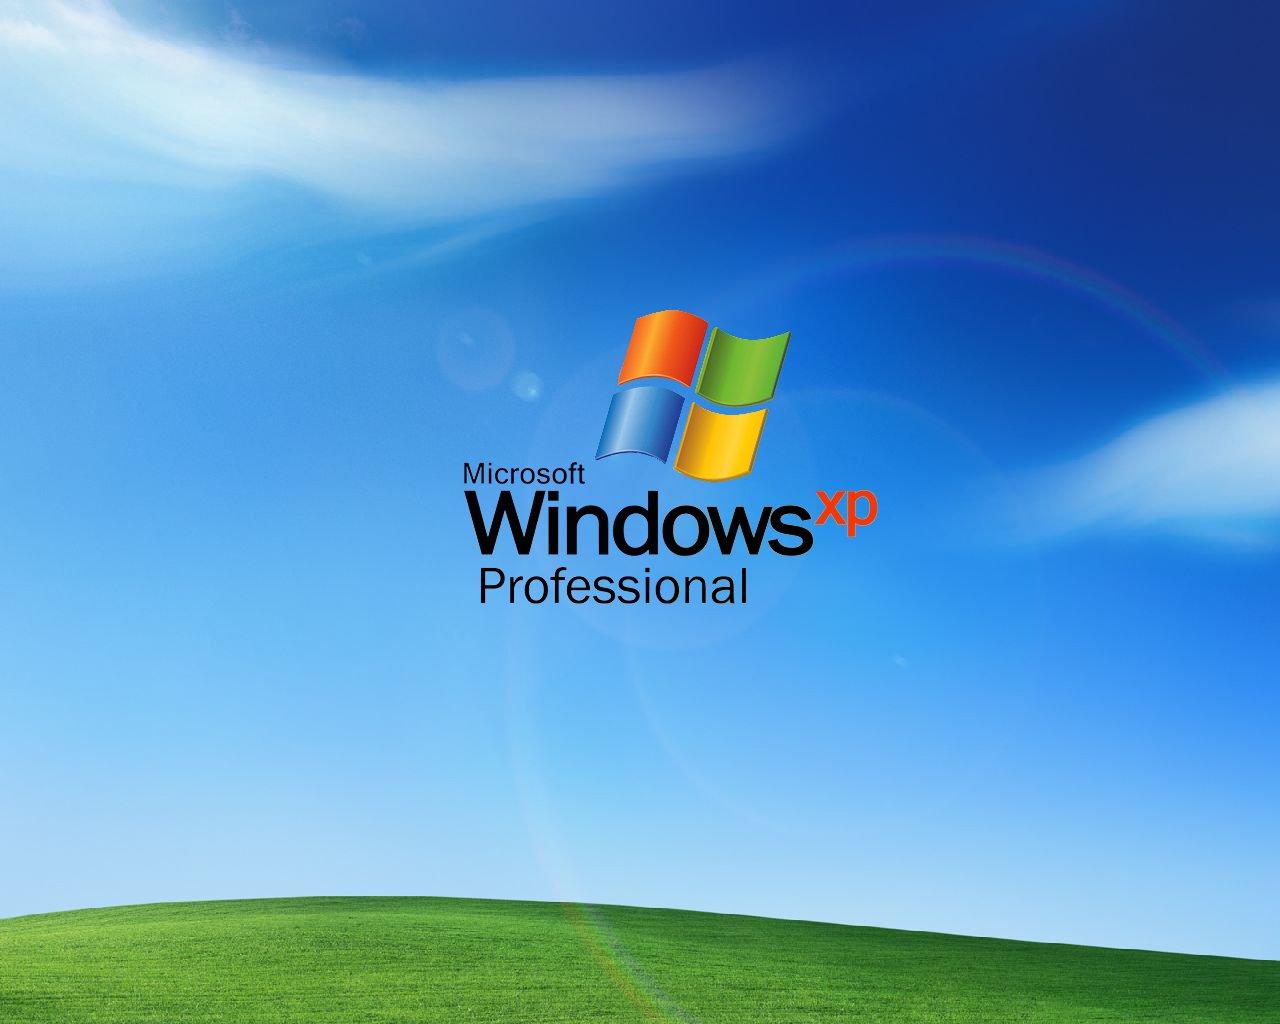 windows xp images - photo #16